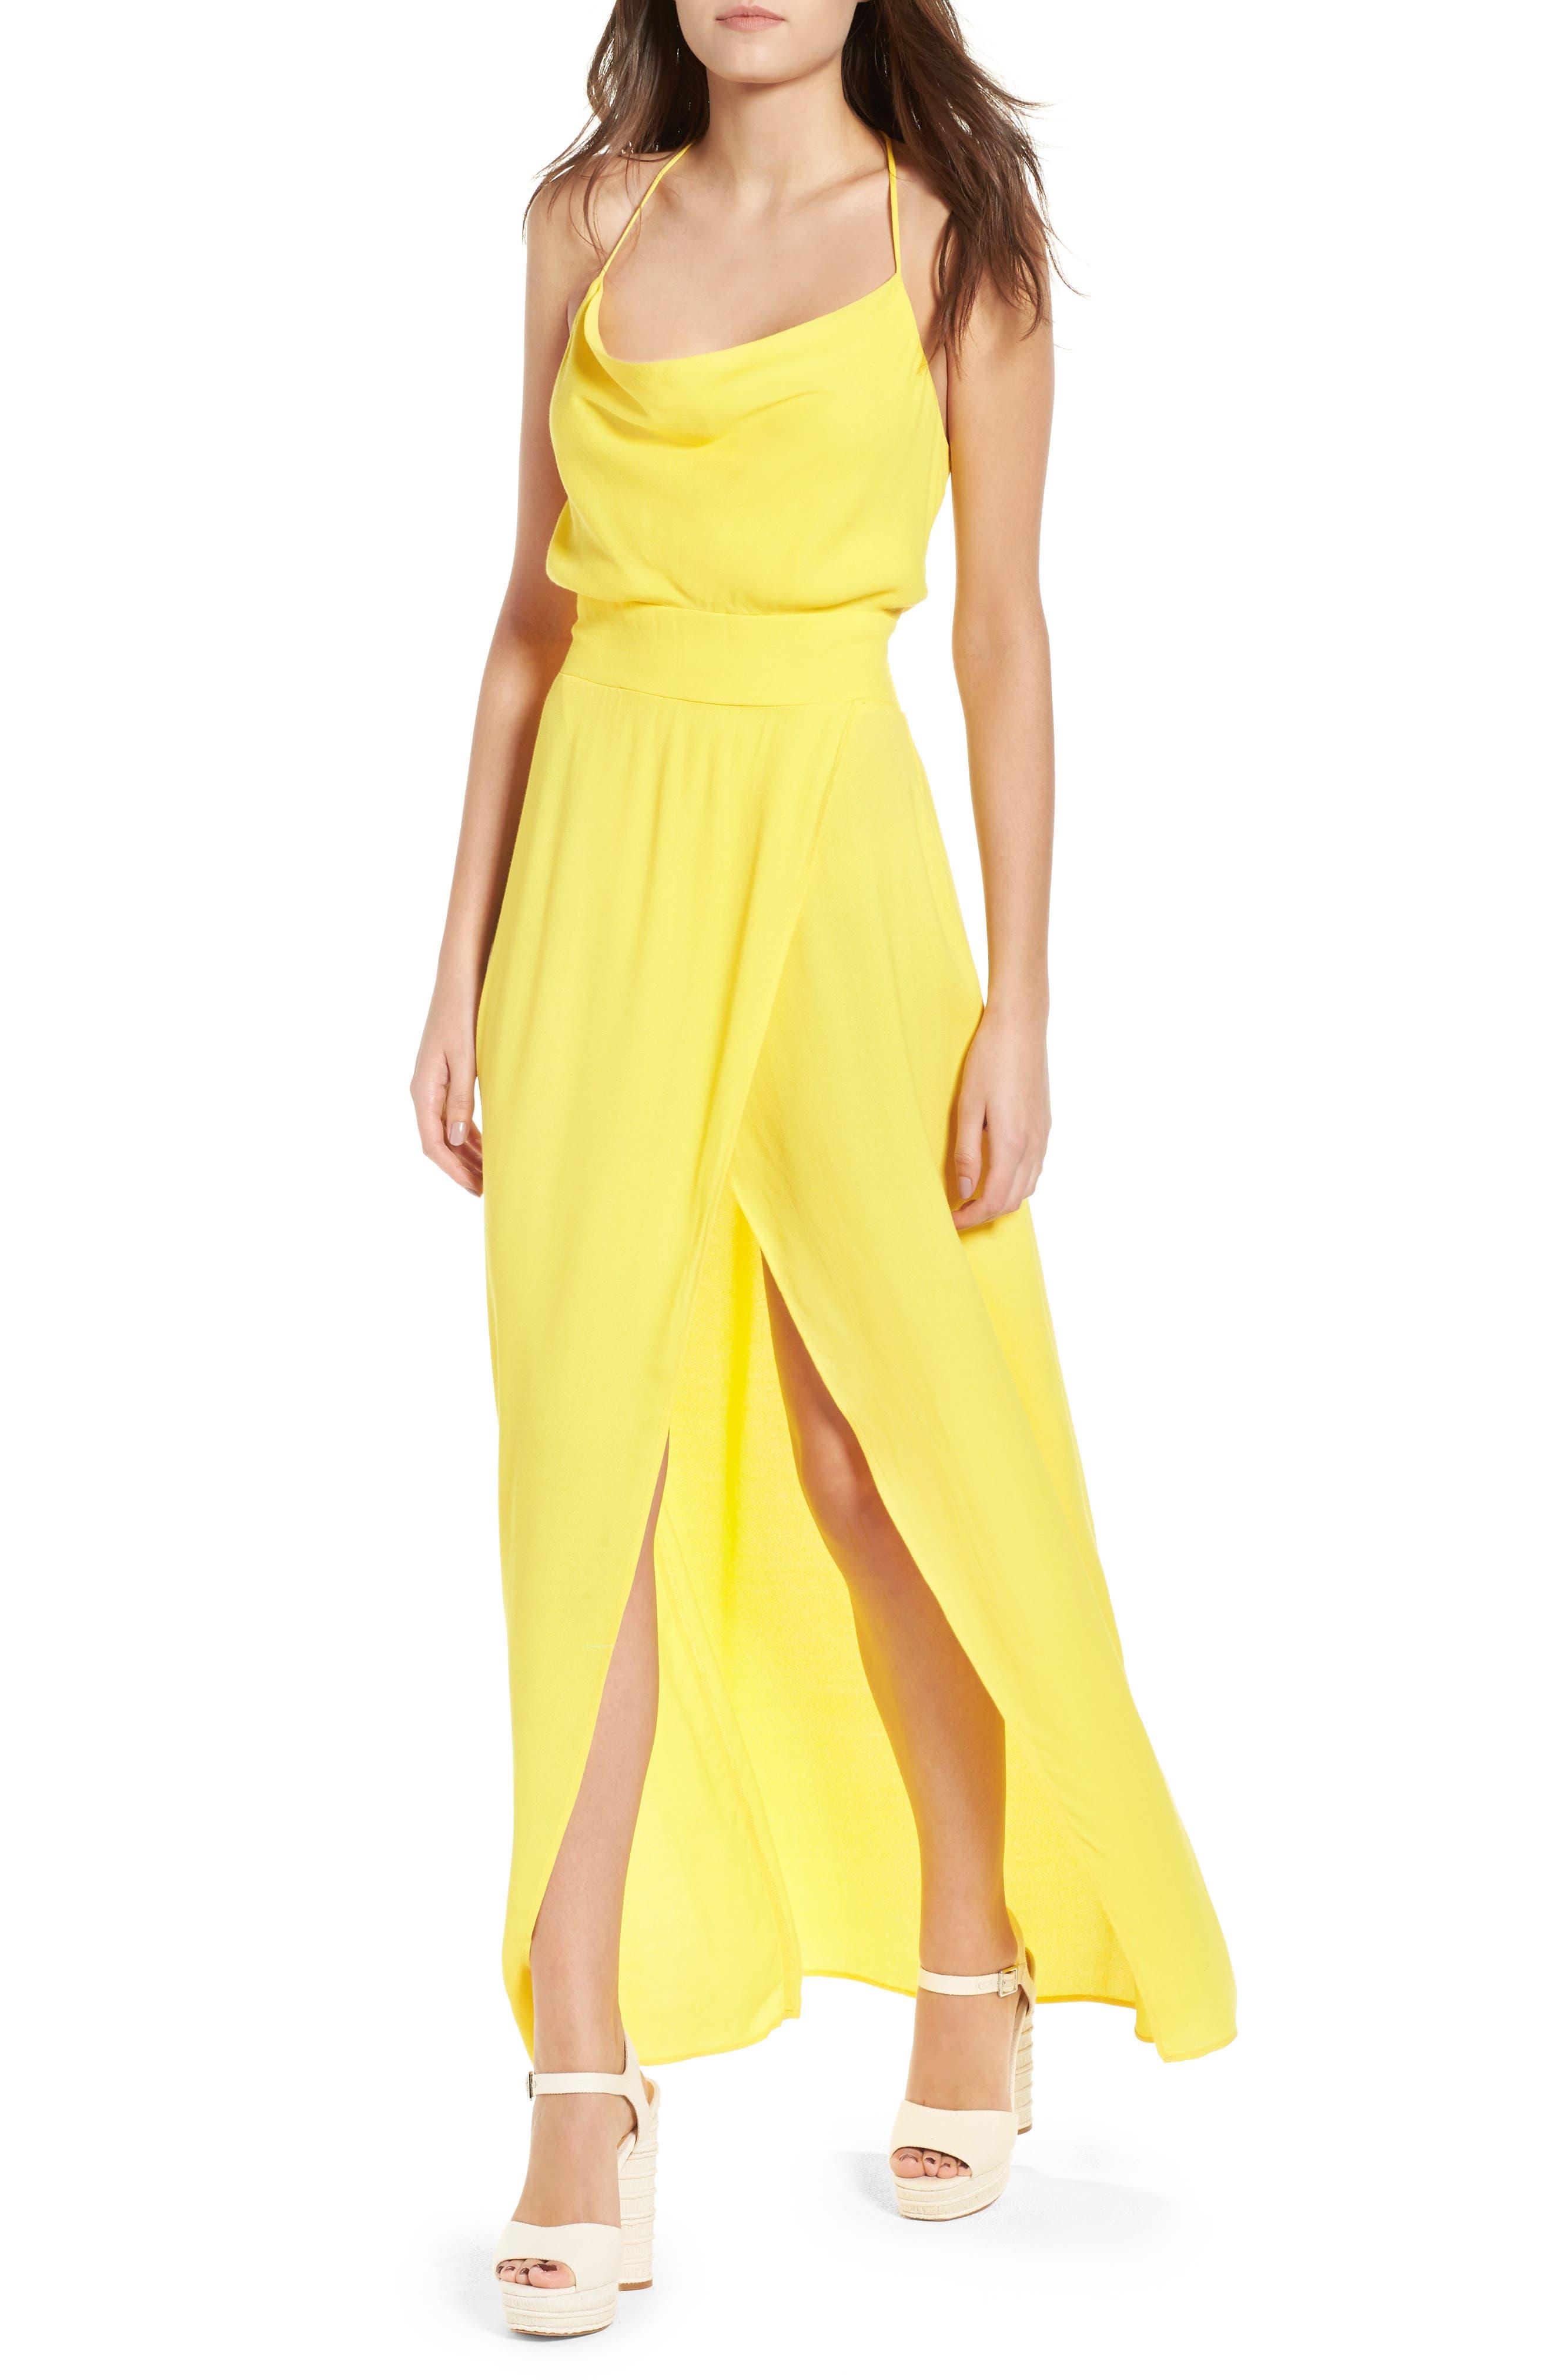 Rain Maxi Dress,                             Main thumbnail 1, color,                             Gold